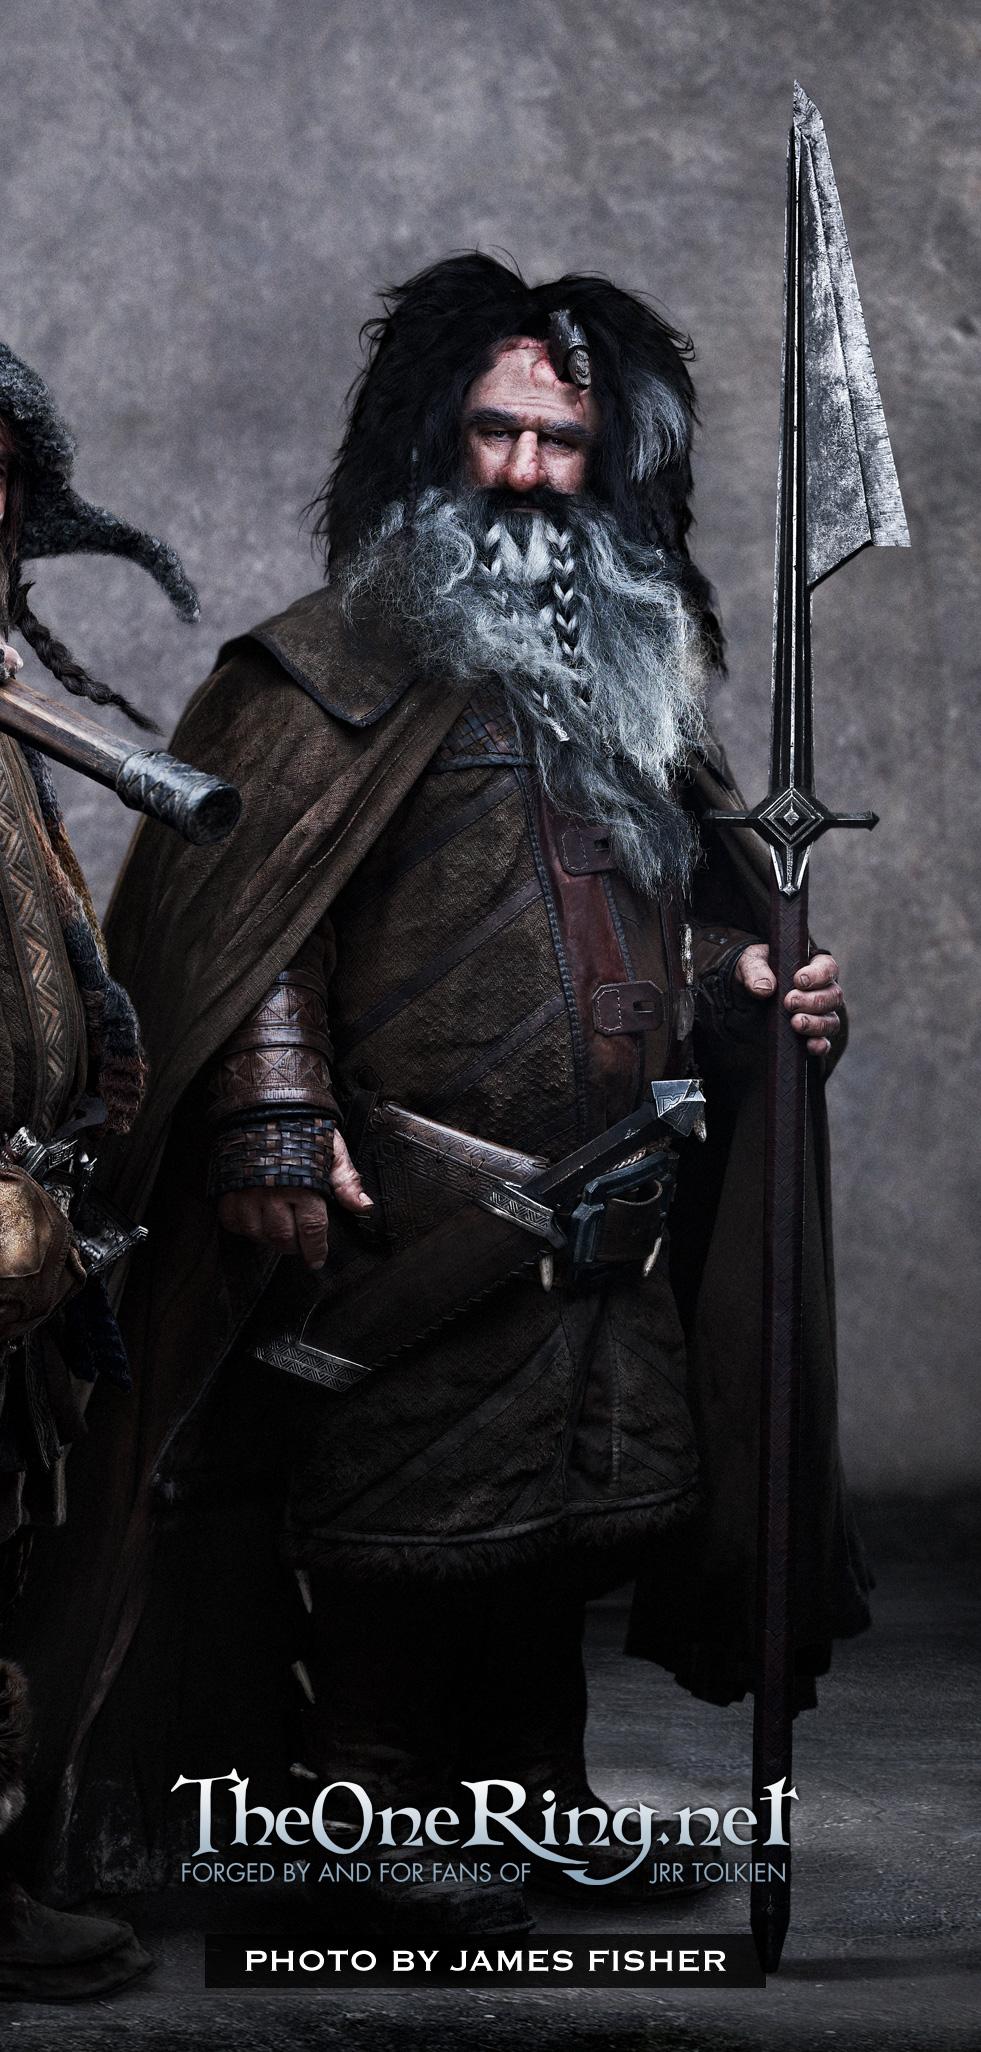 Analysis: TheOneRing net Staff Talk Dwarves | J R R  Tolkien Books